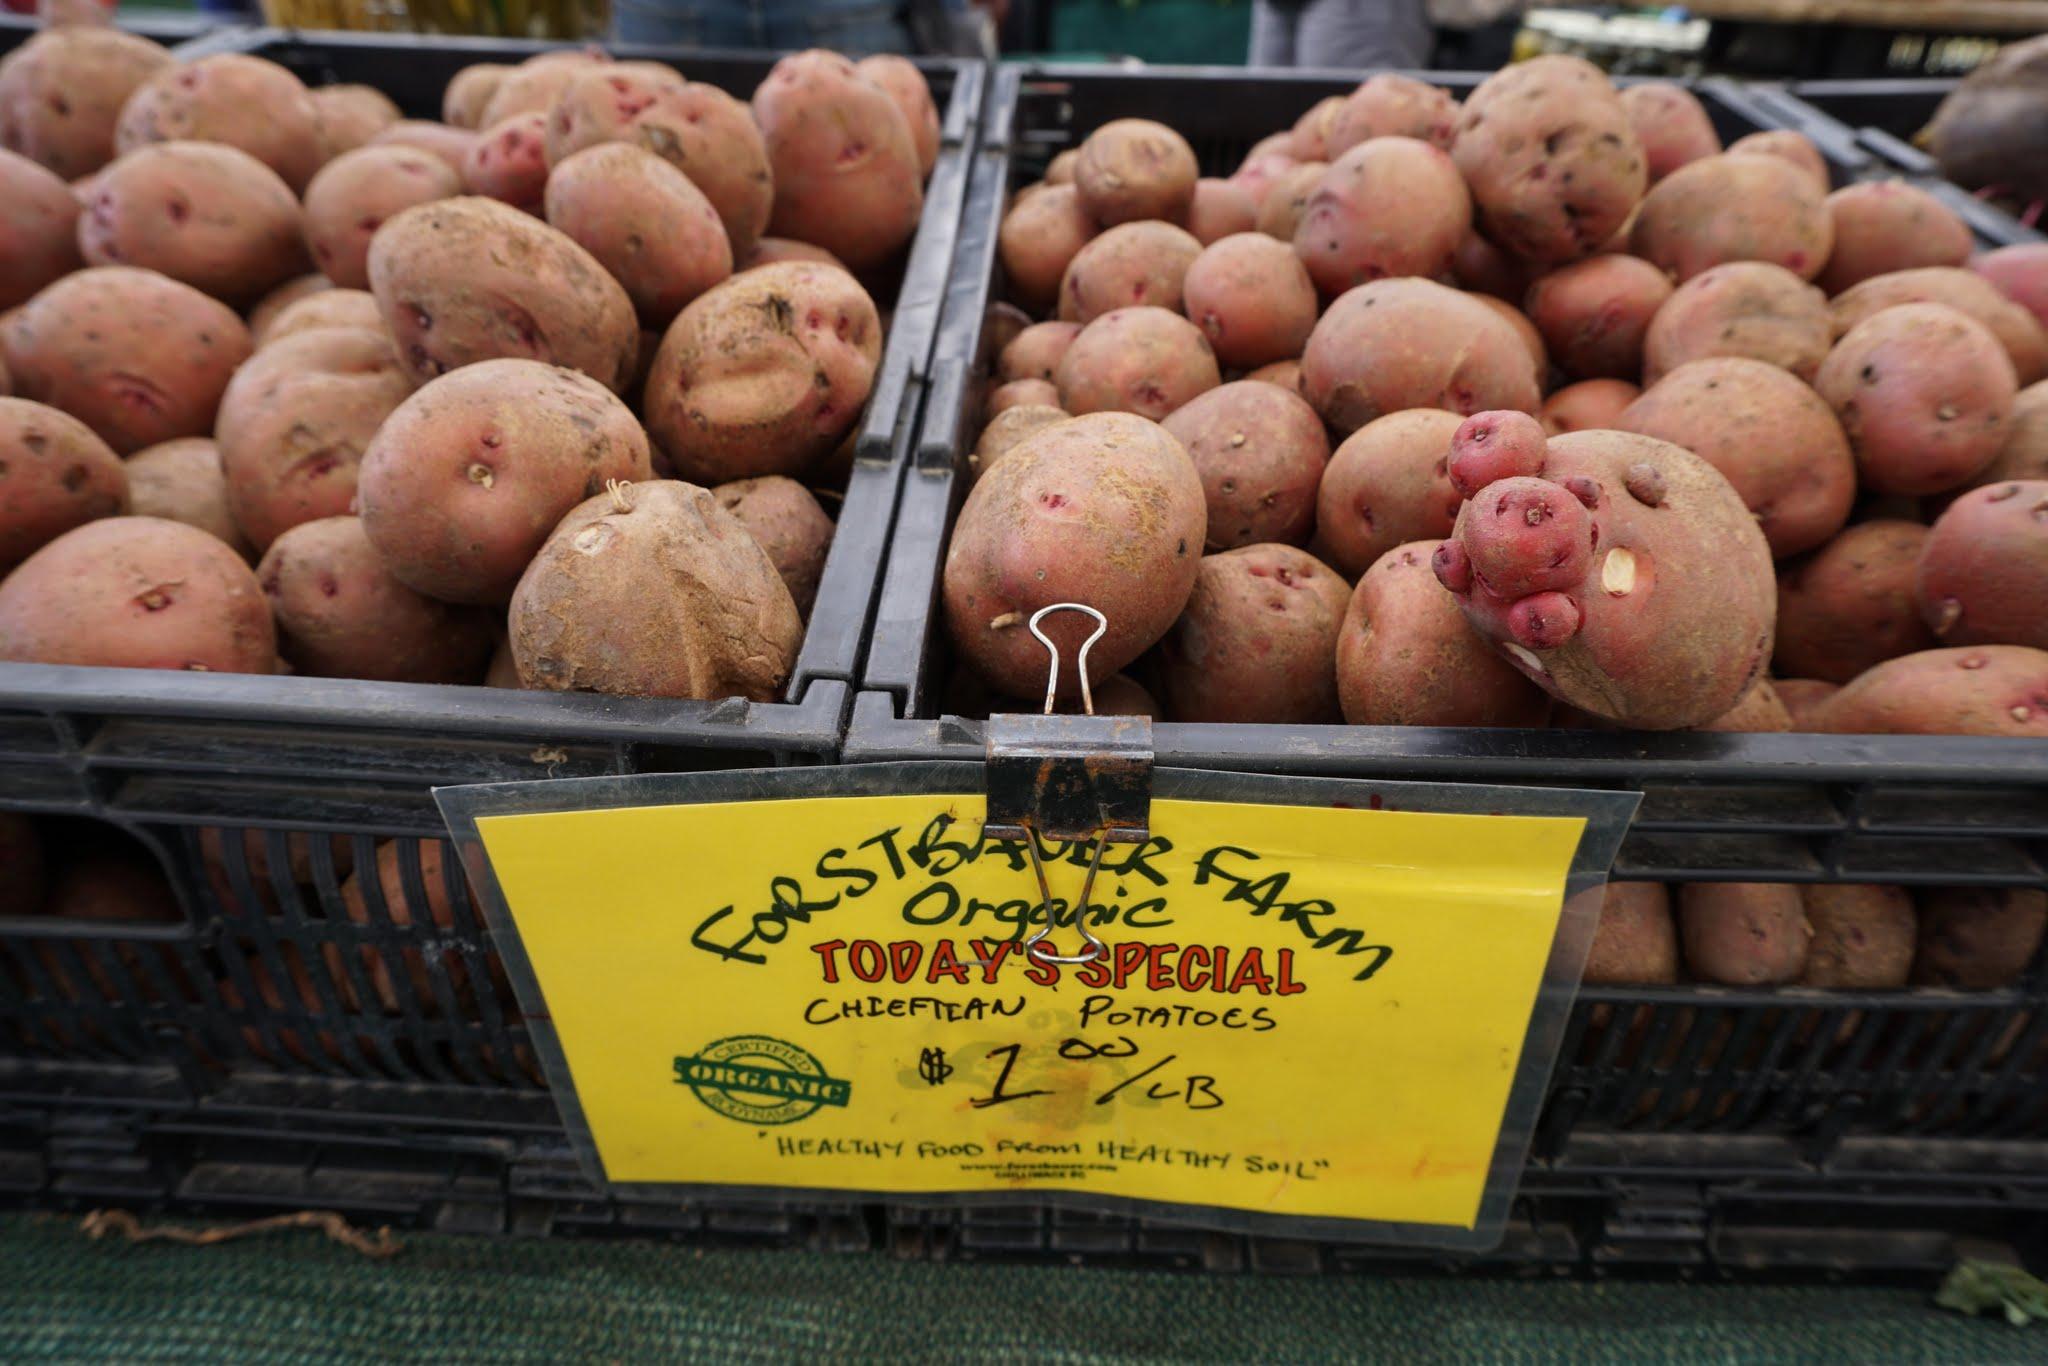 Chieftan potatoes